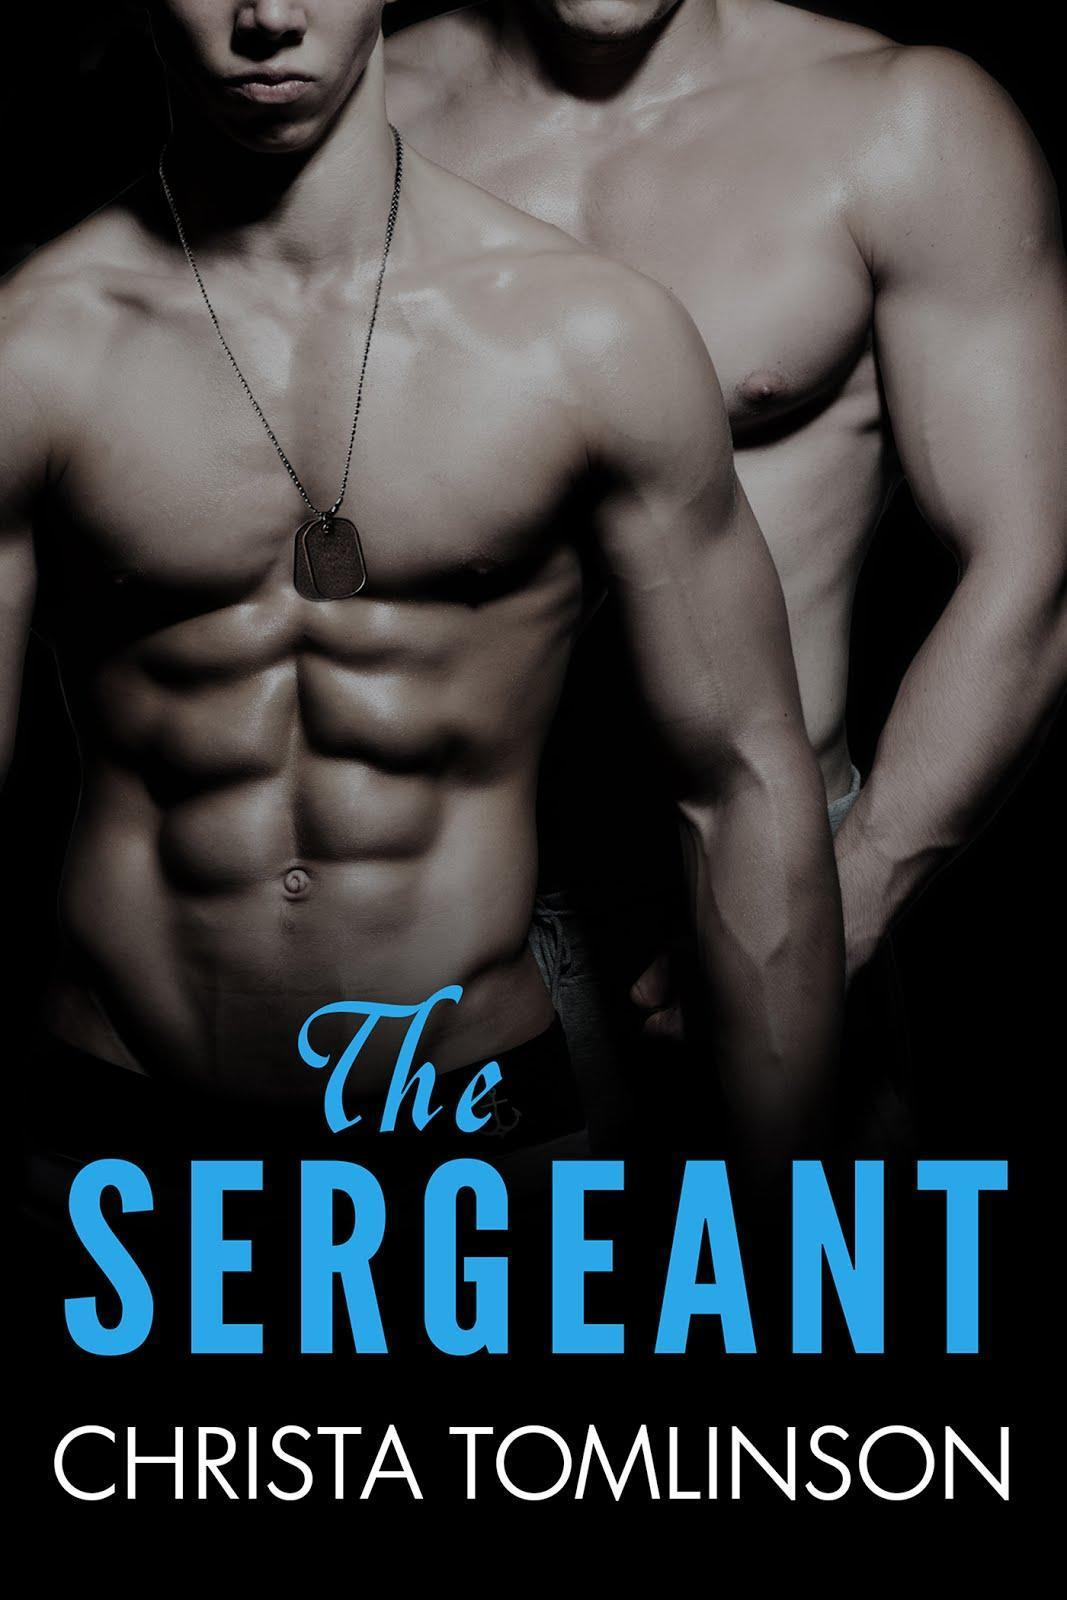 The Sergeant EBOOK UPLOAD - Copy.jpg